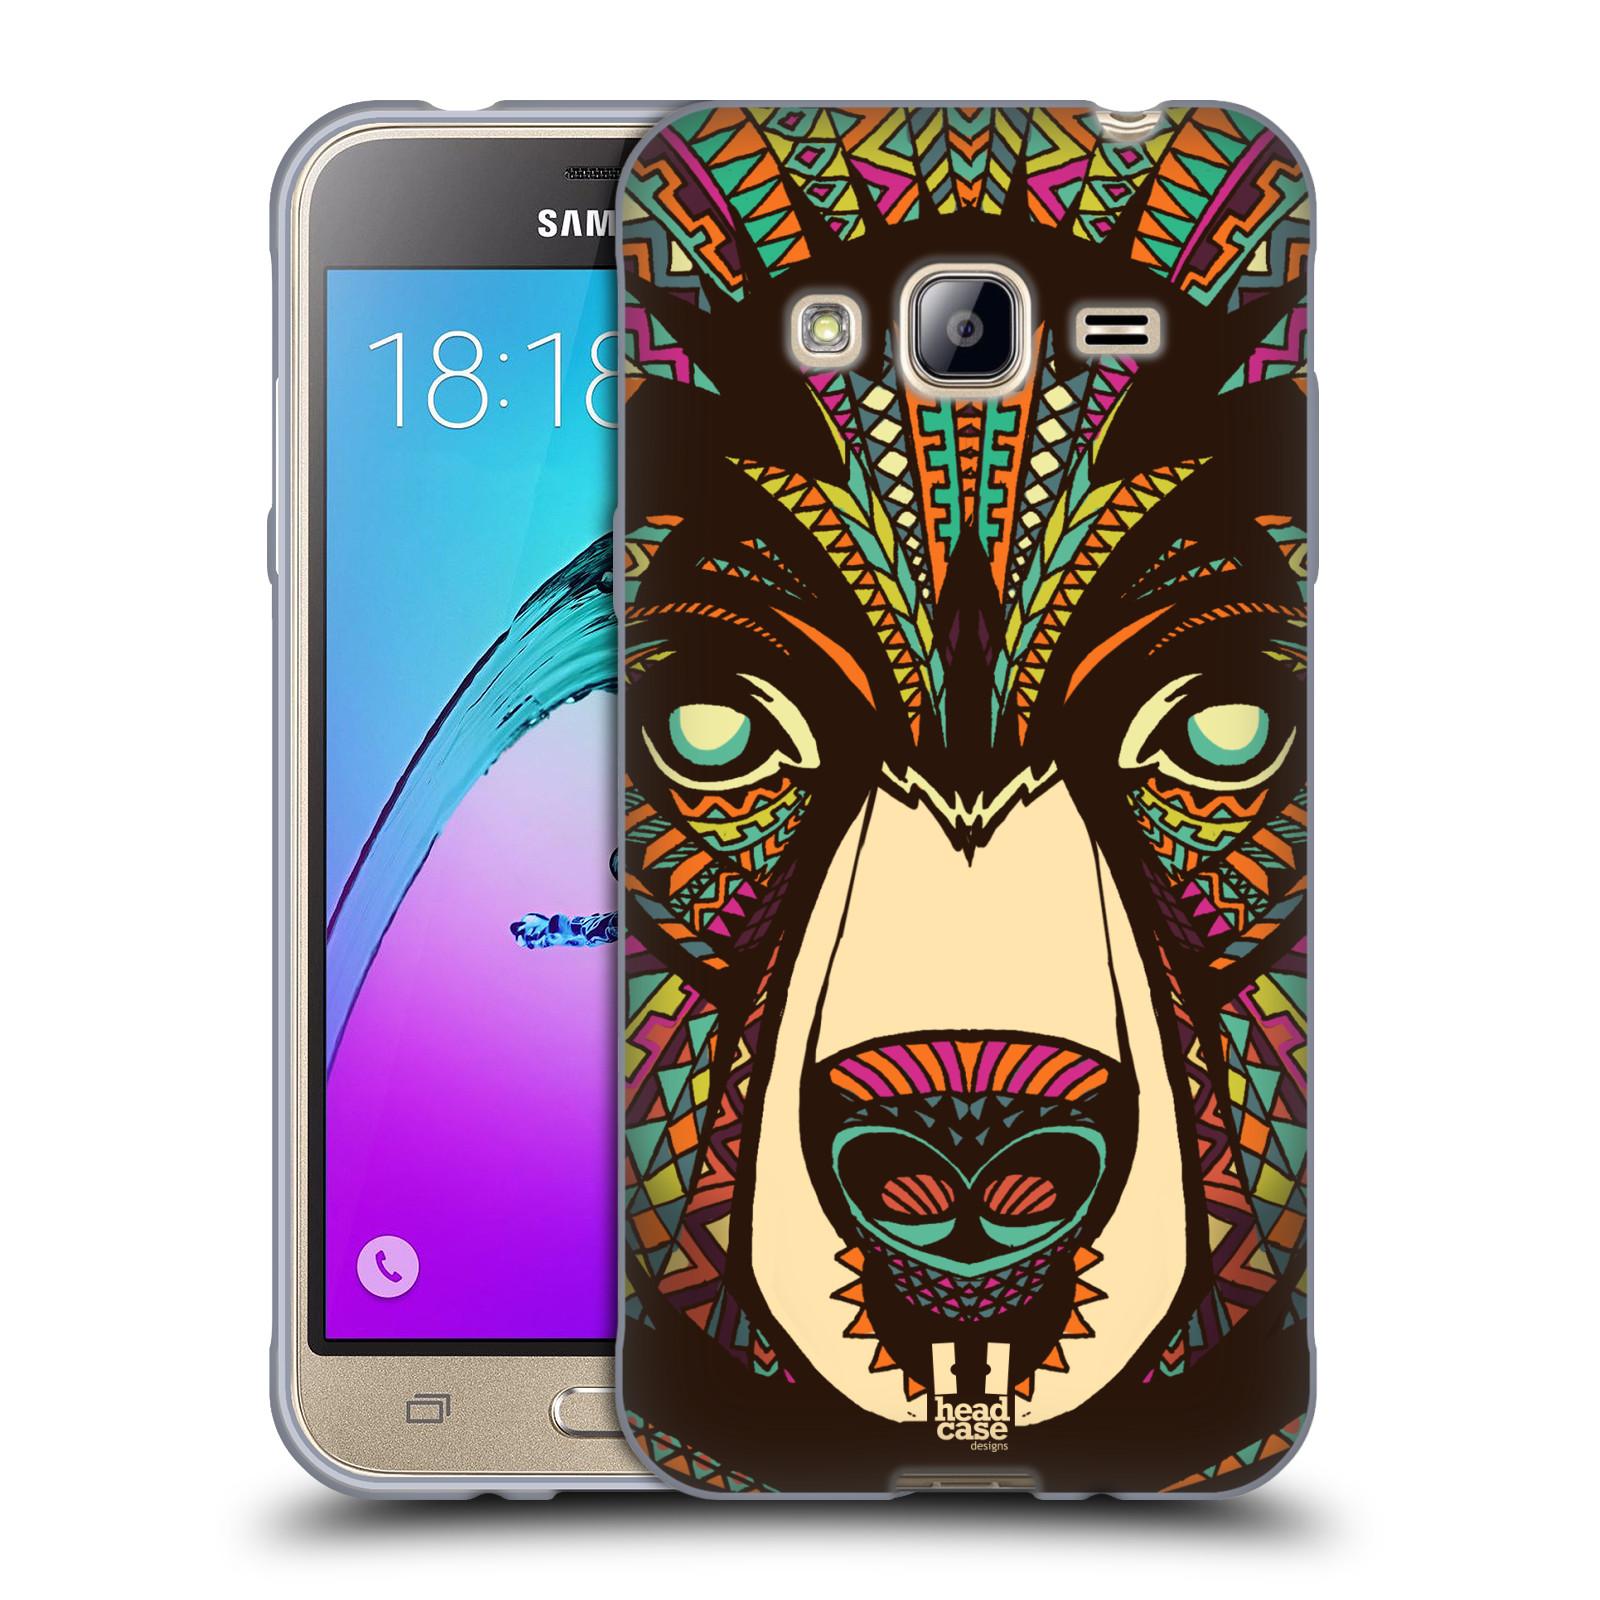 HEAD CASE silikonový obal na mobil Samsung Galaxy J3, J3 2016 vzor Aztécký motiv zvíře medvěd